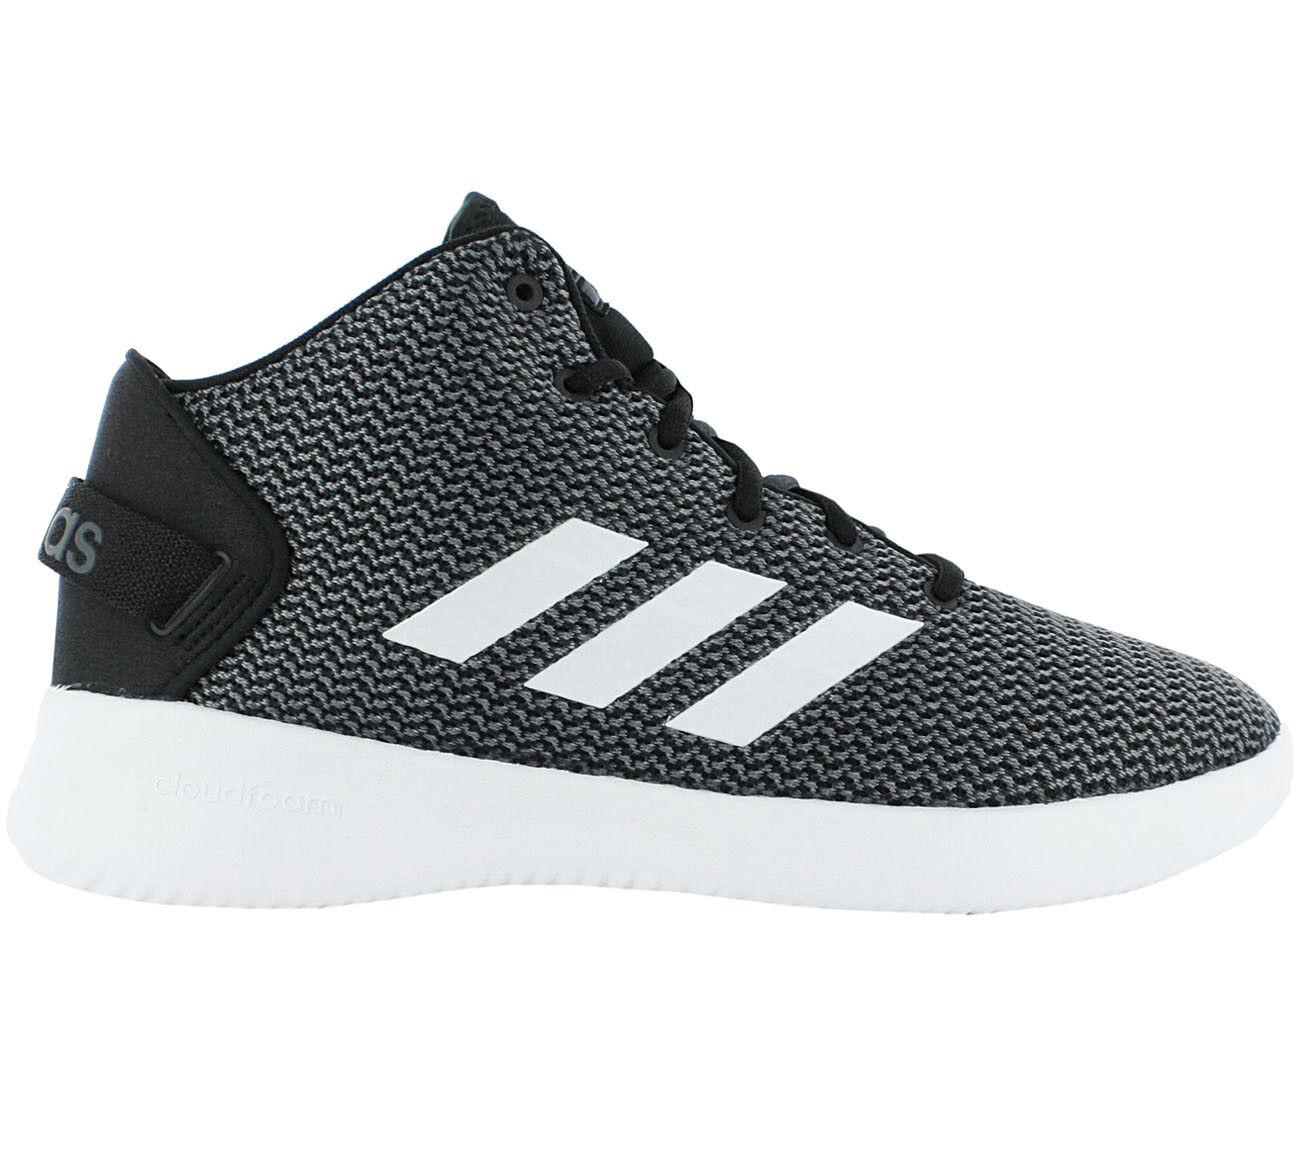 adidas Herren Sneaker Cloudfoam Refresh Mid CF Schuhe Schwarz Freizeit BB9905